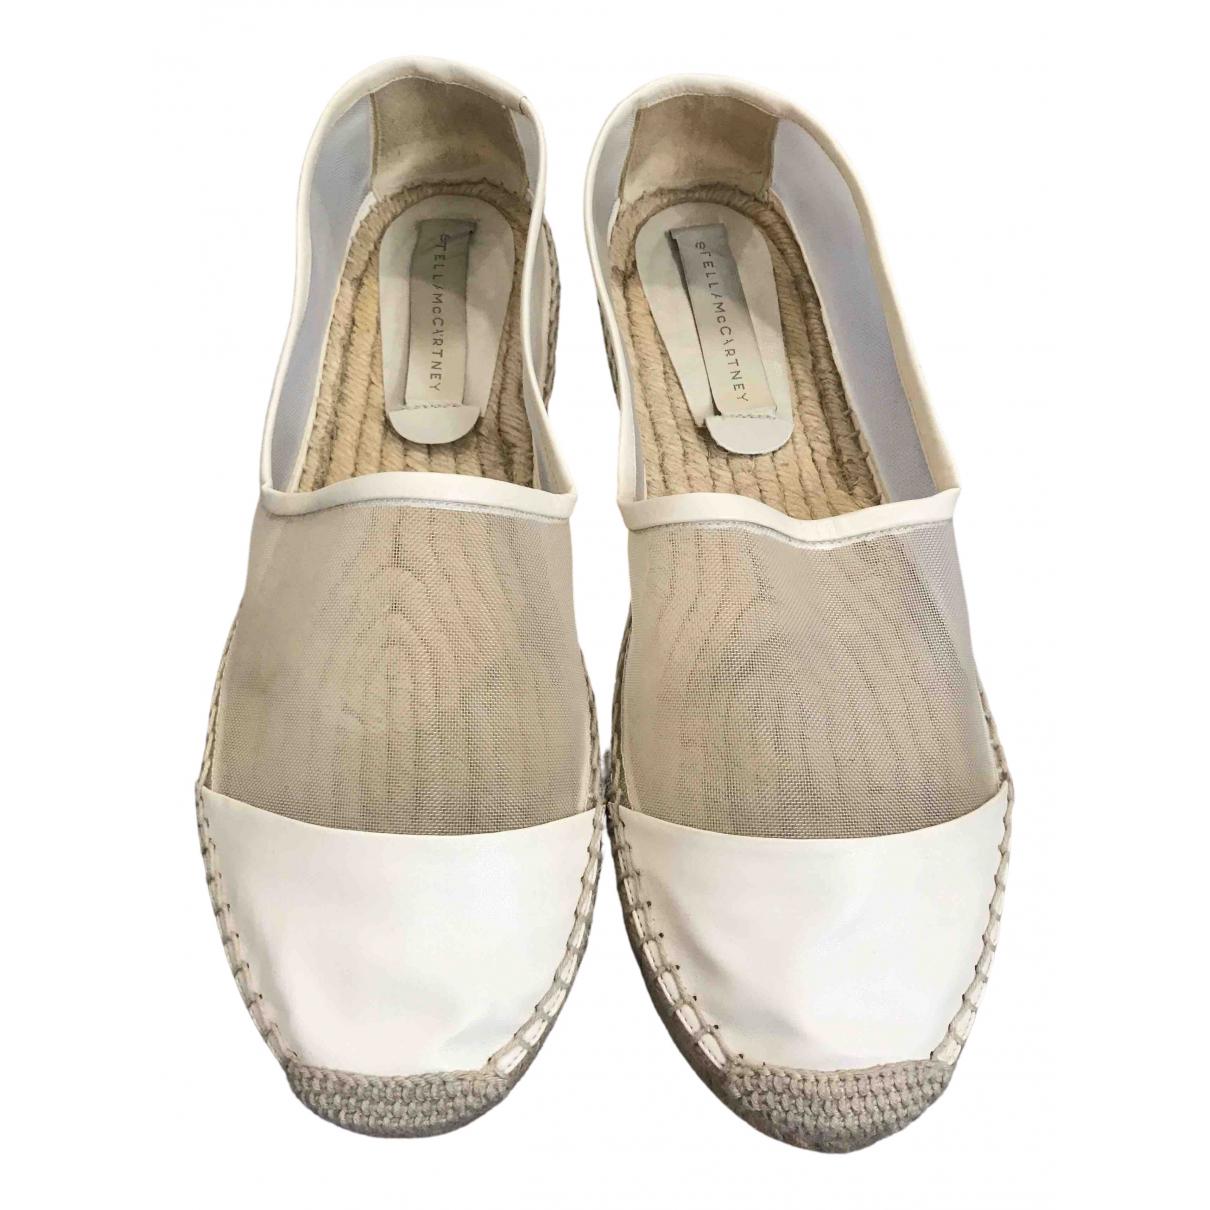 Stella Mccartney \N White Leather Espadrilles for Women 41 EU